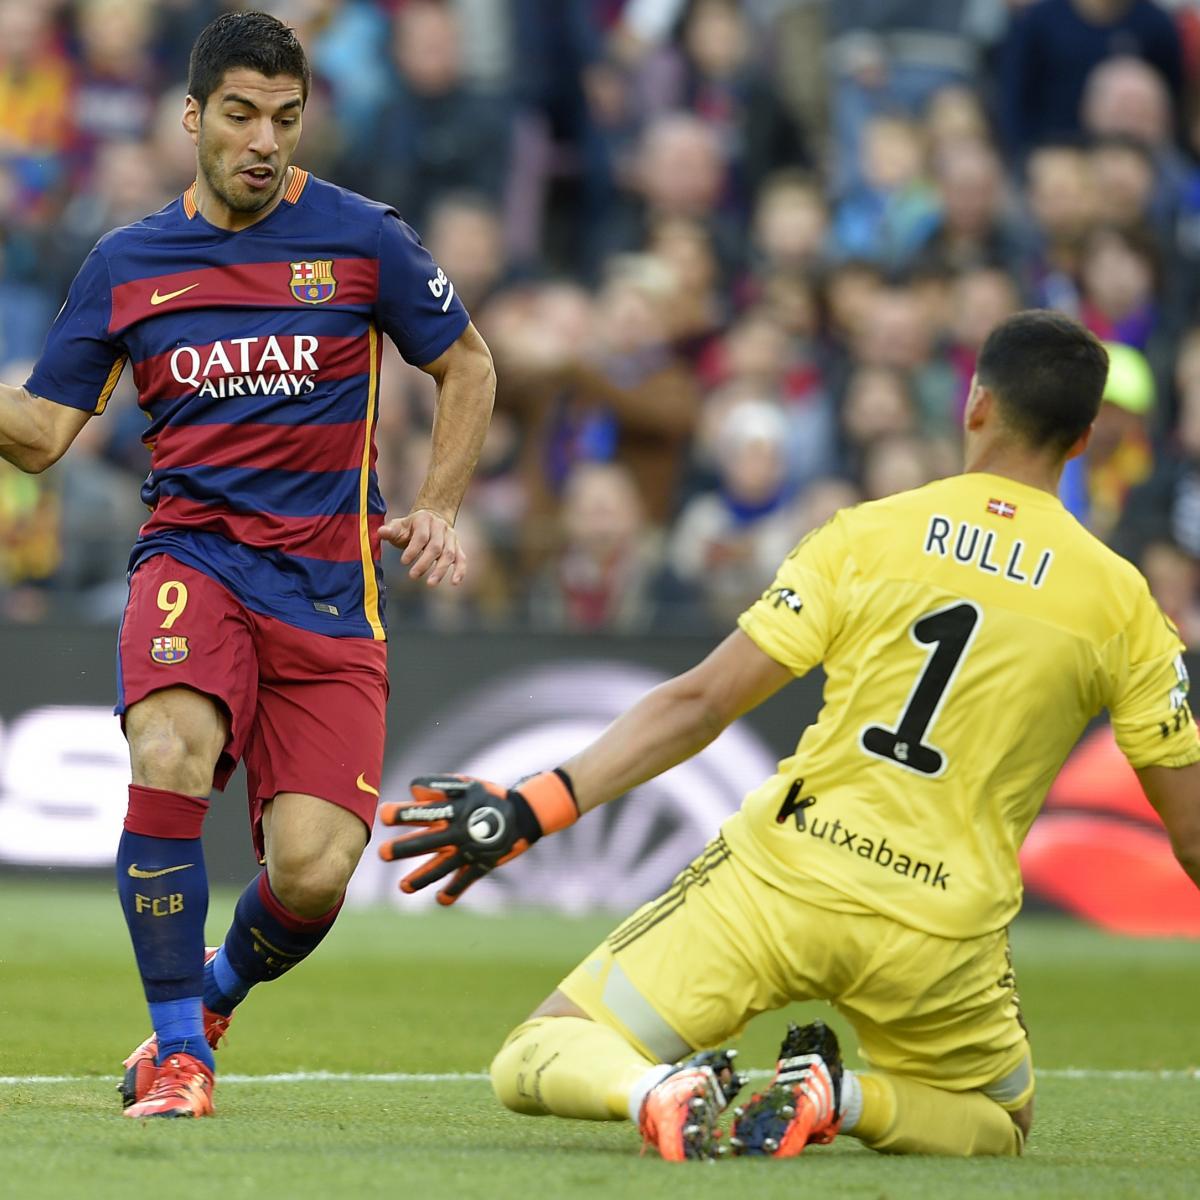 Liverpool V Barcelona Live Matchday Blog: Barcelona Vs. Real Sociedad: Live Score, Highlights From